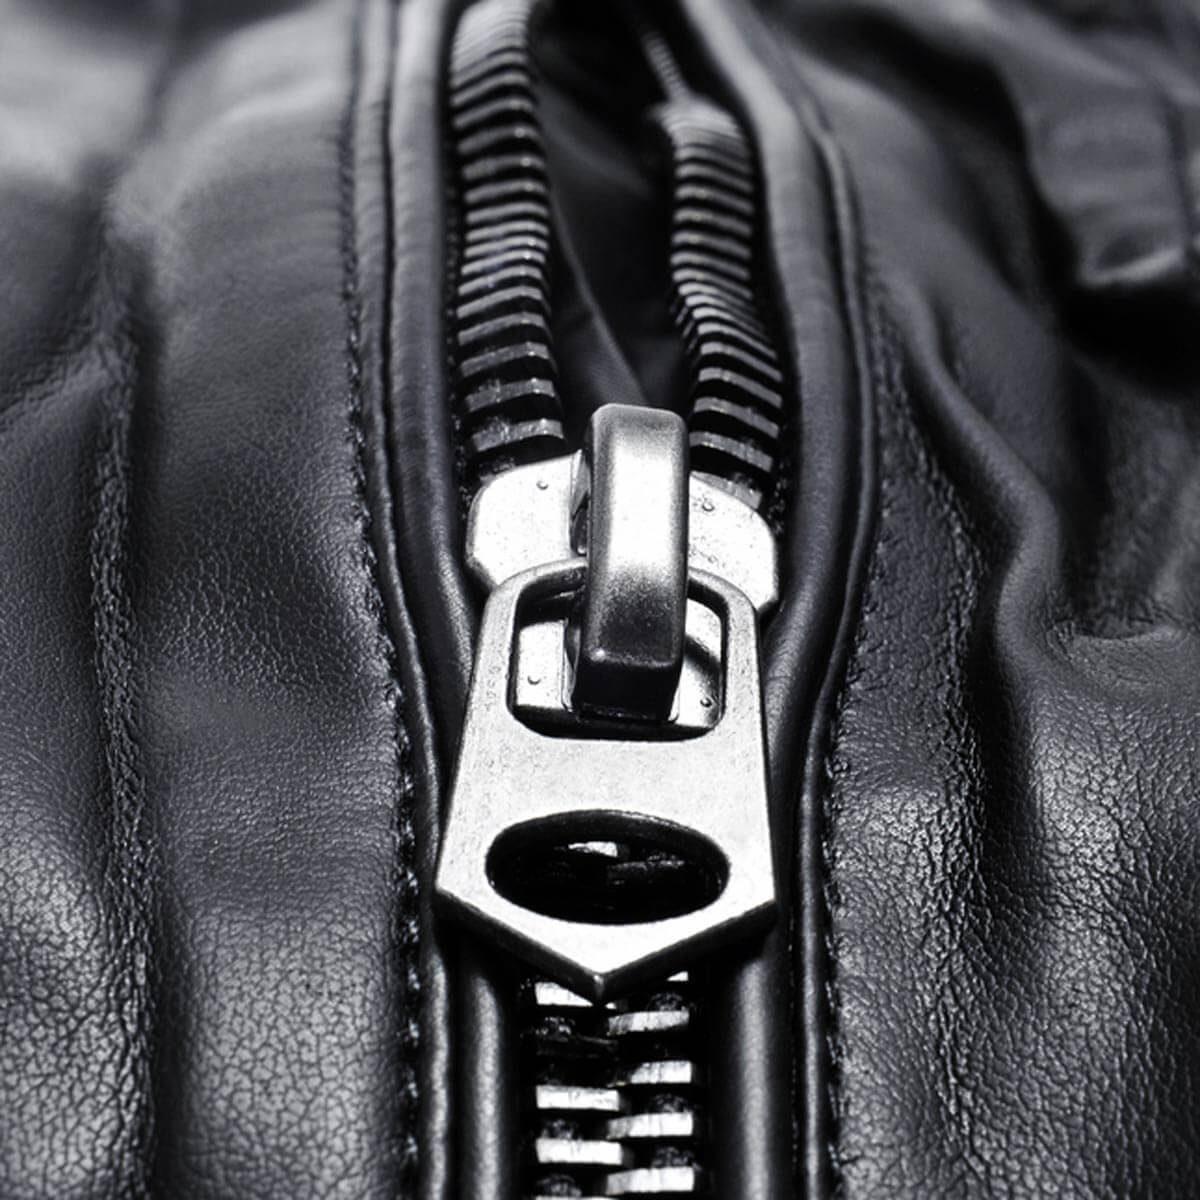 Jacket Zipper WD-40